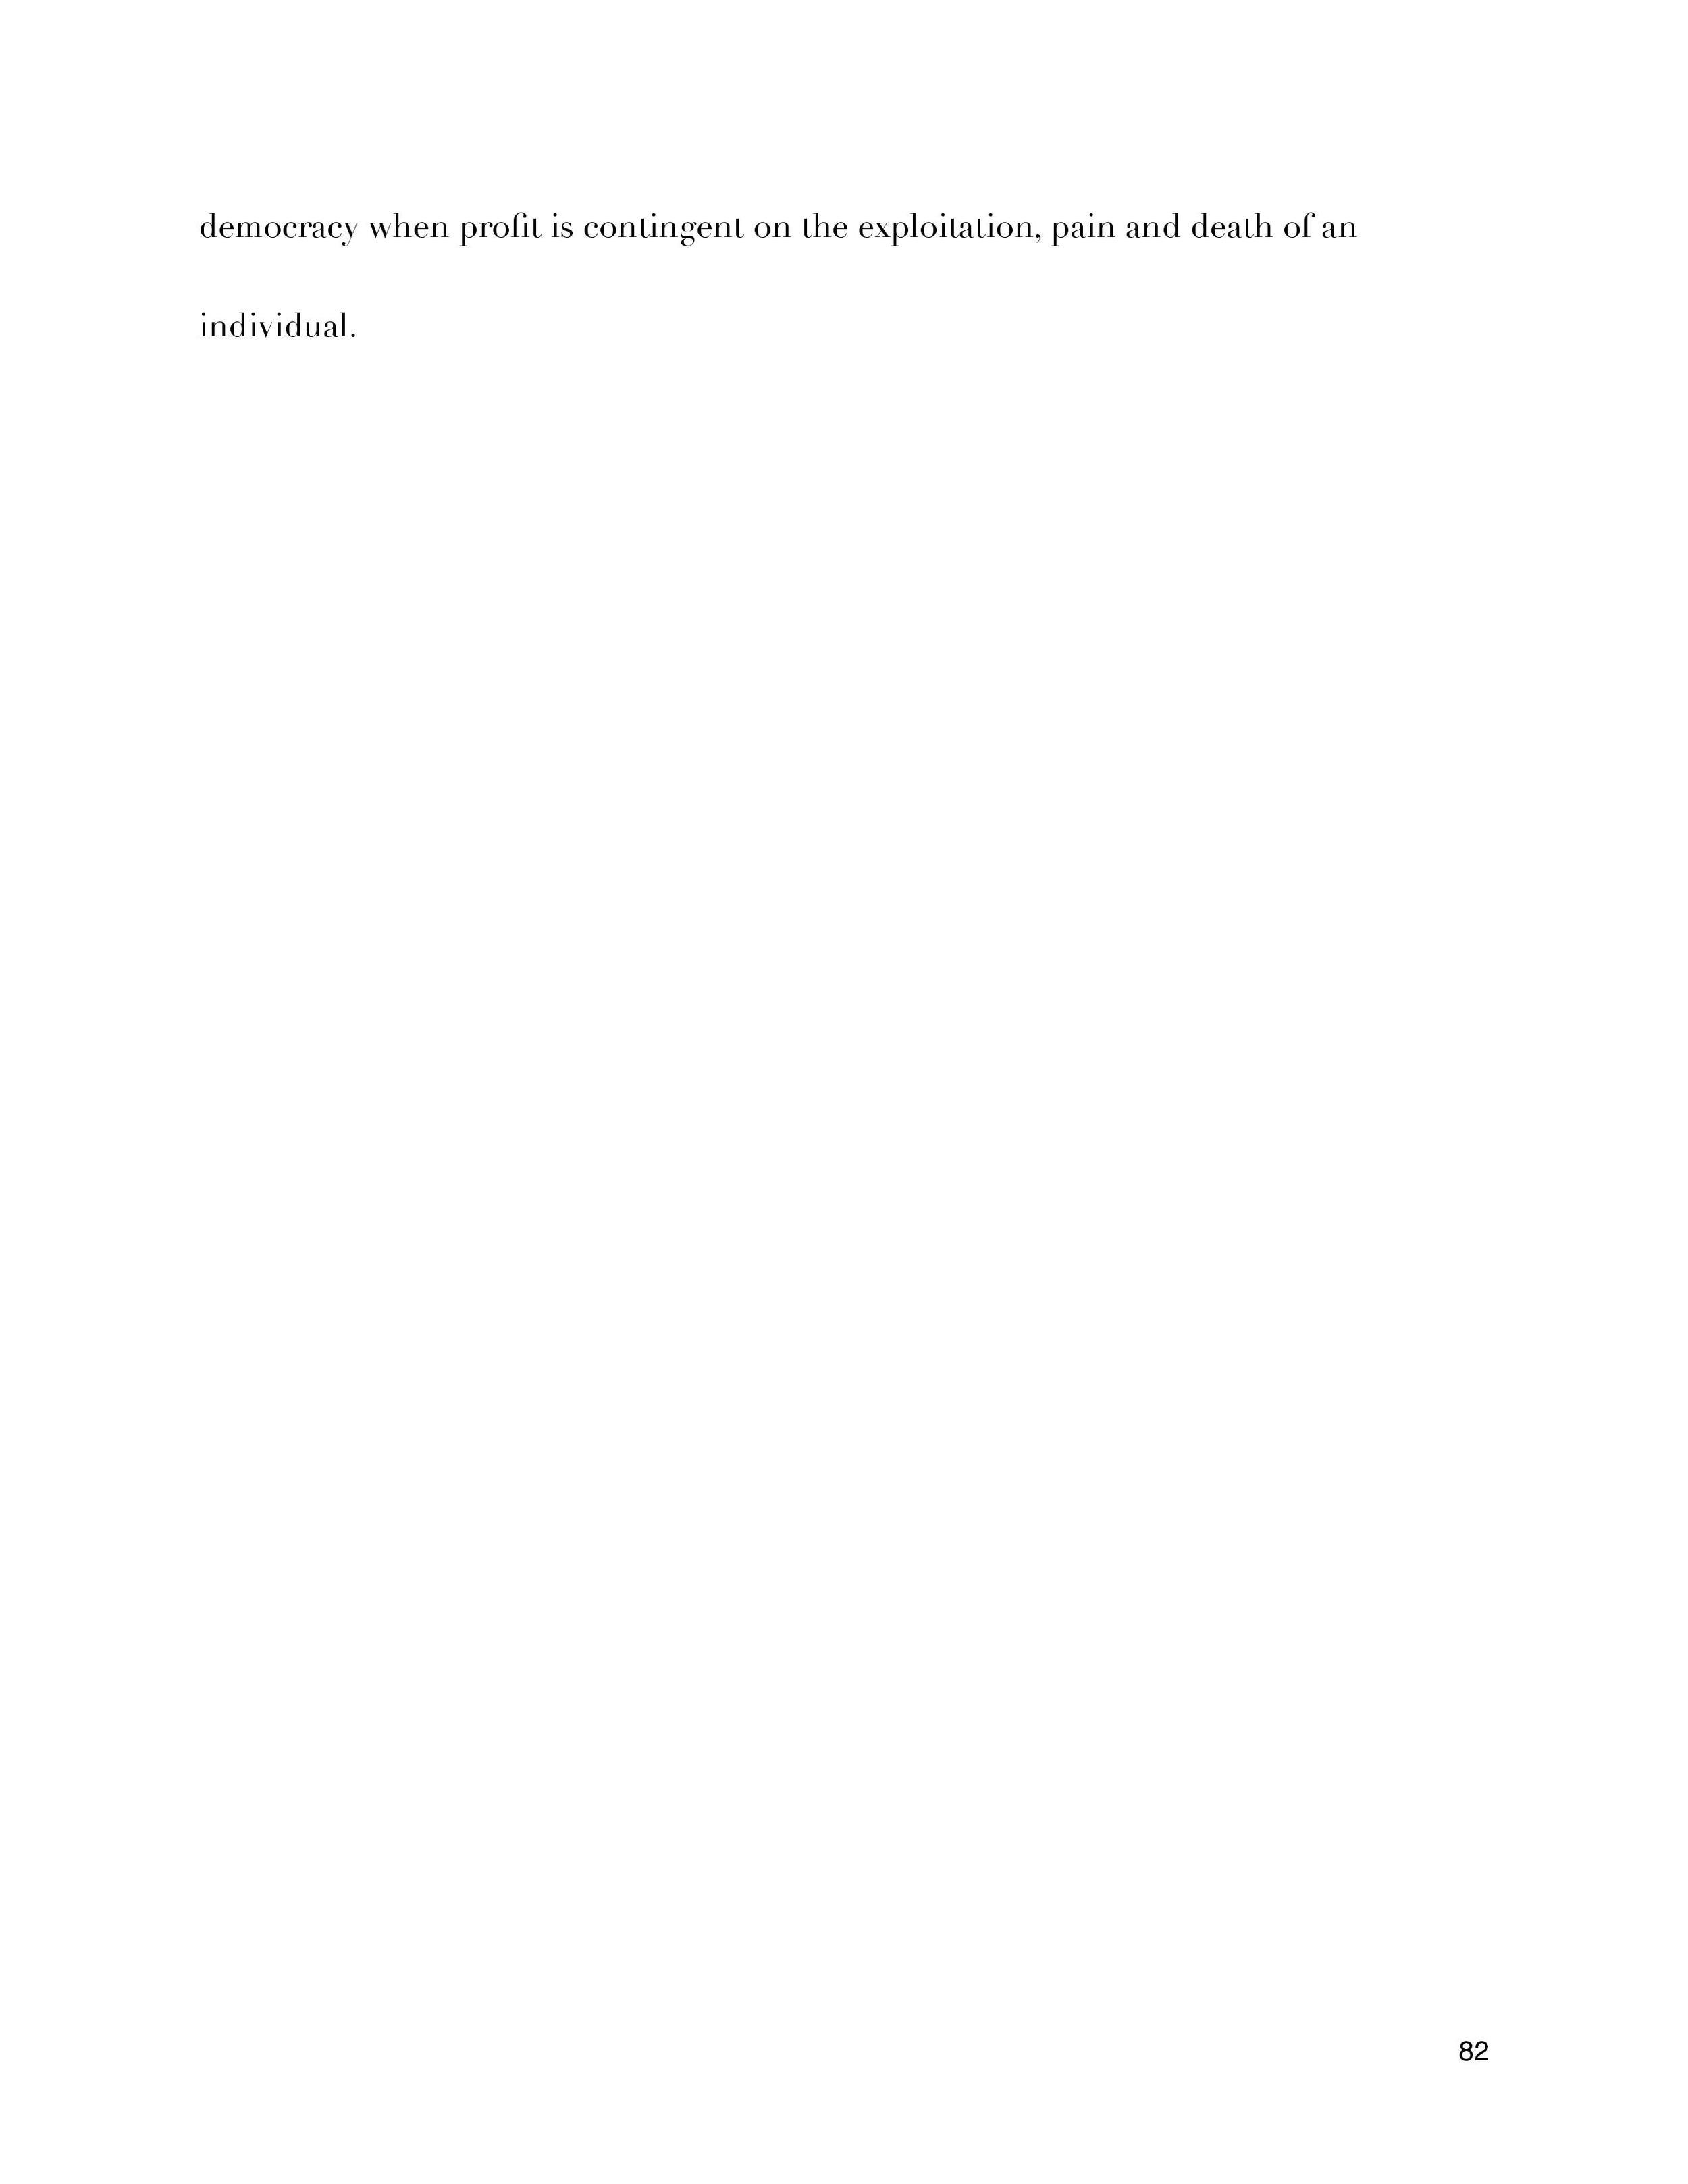 ShatteredGlass-page-083.jpg